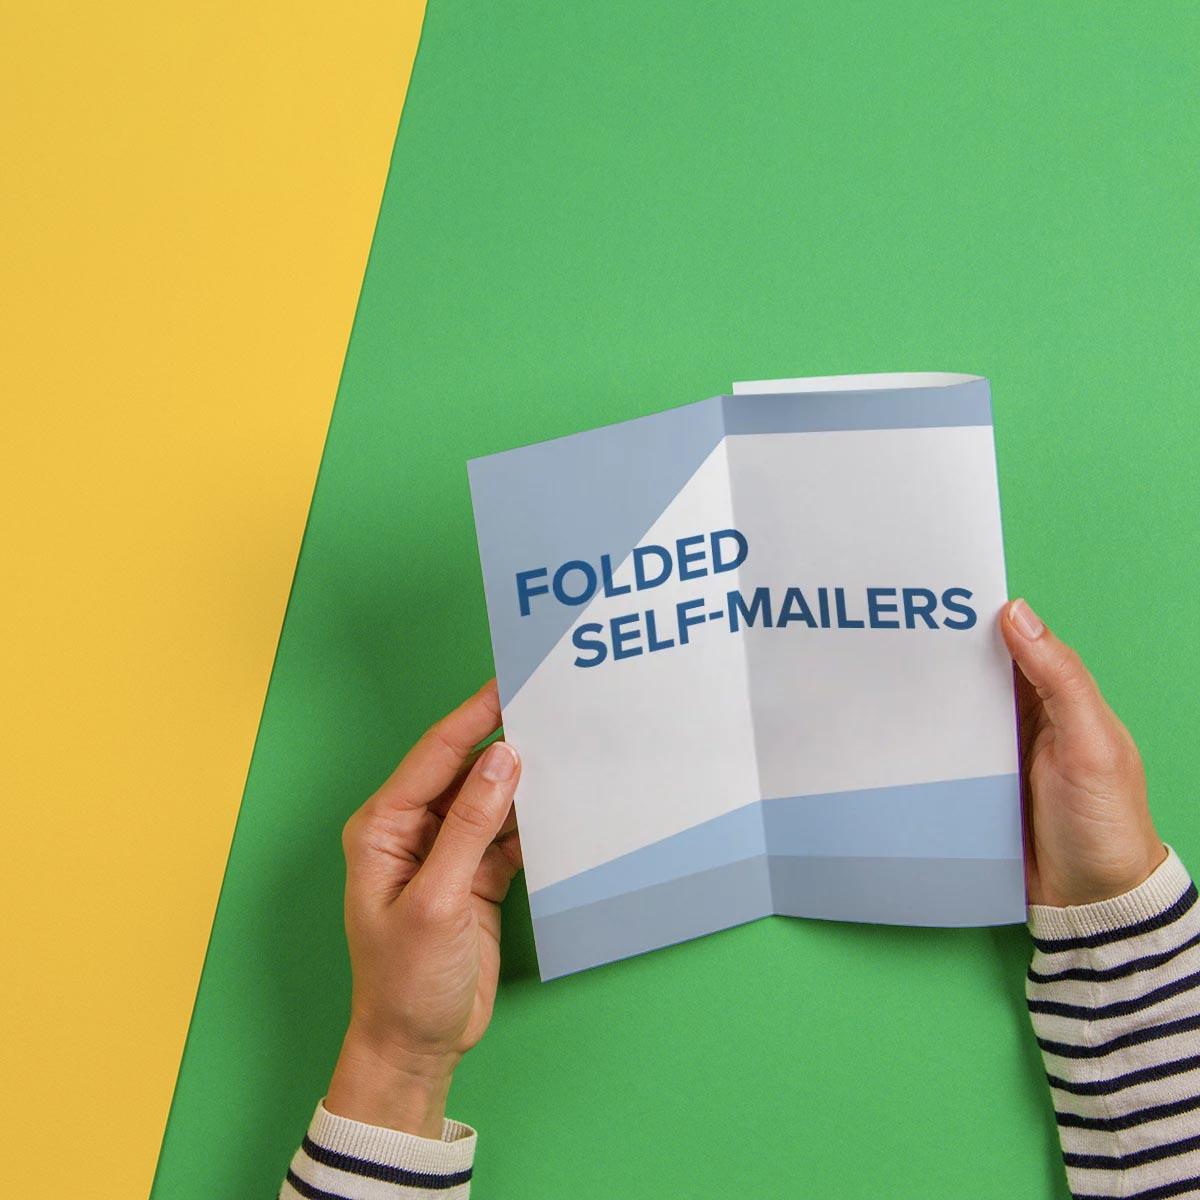 folded self mailers2